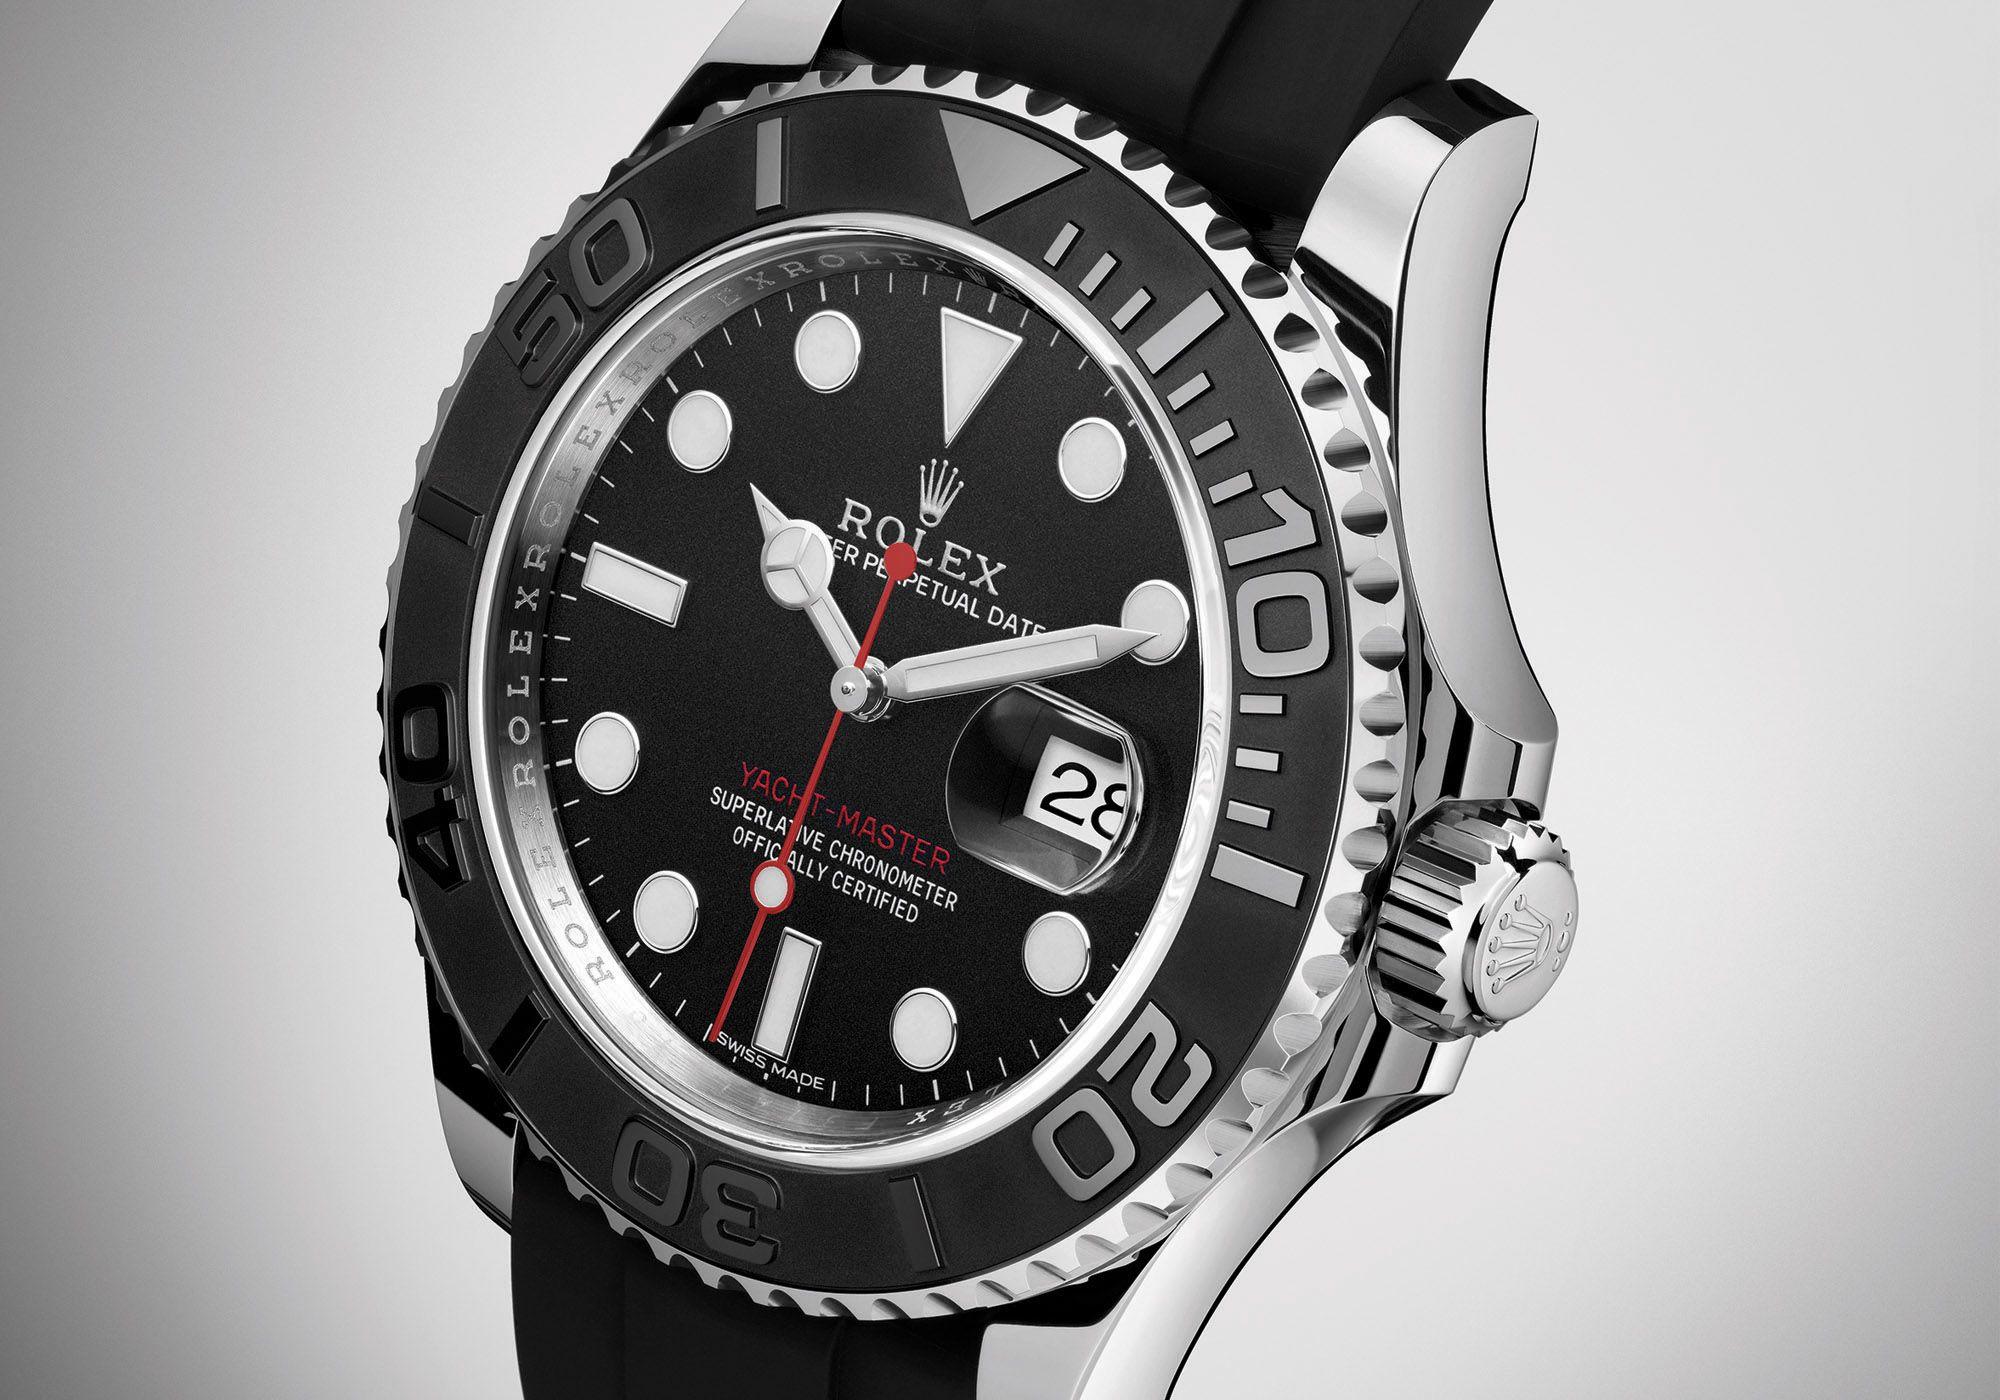 Rolex Yacht Master Steel Ceramic Bezel Black Dial Rubber - Rolex Baselworld 2017 - Rolex Predictions 2017